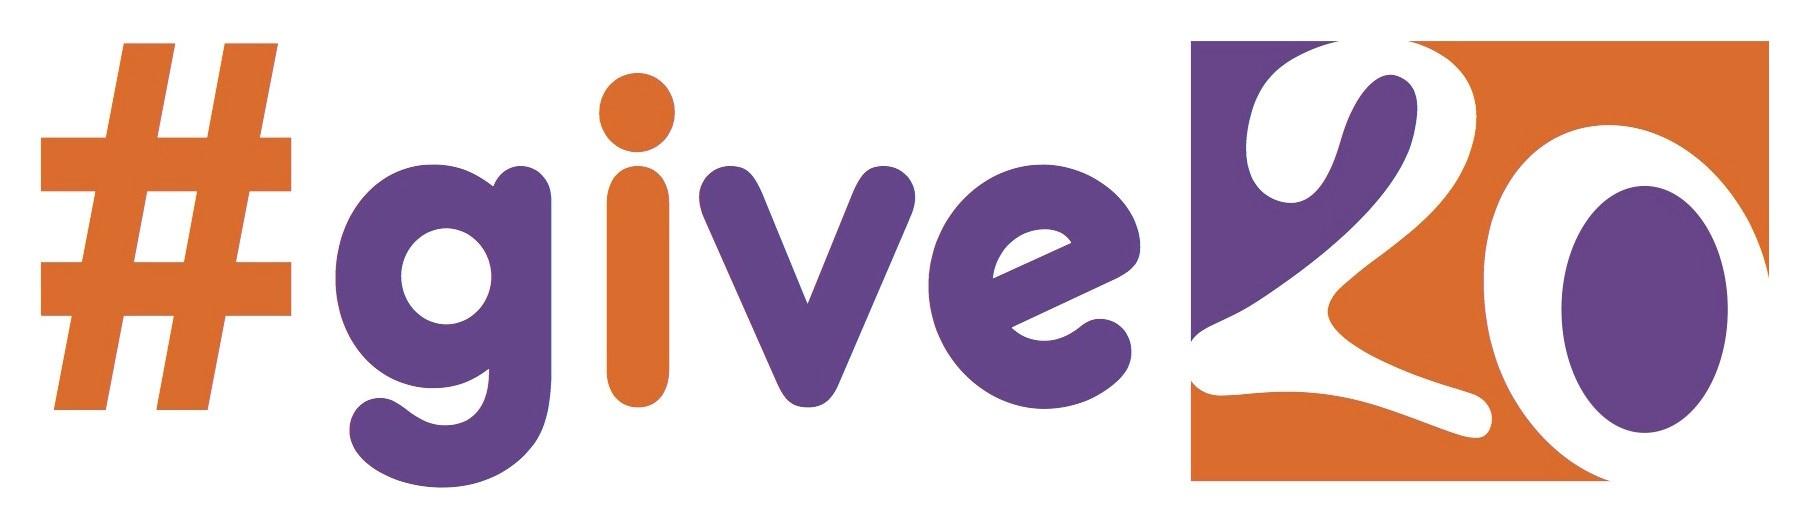 Move On 20th logo